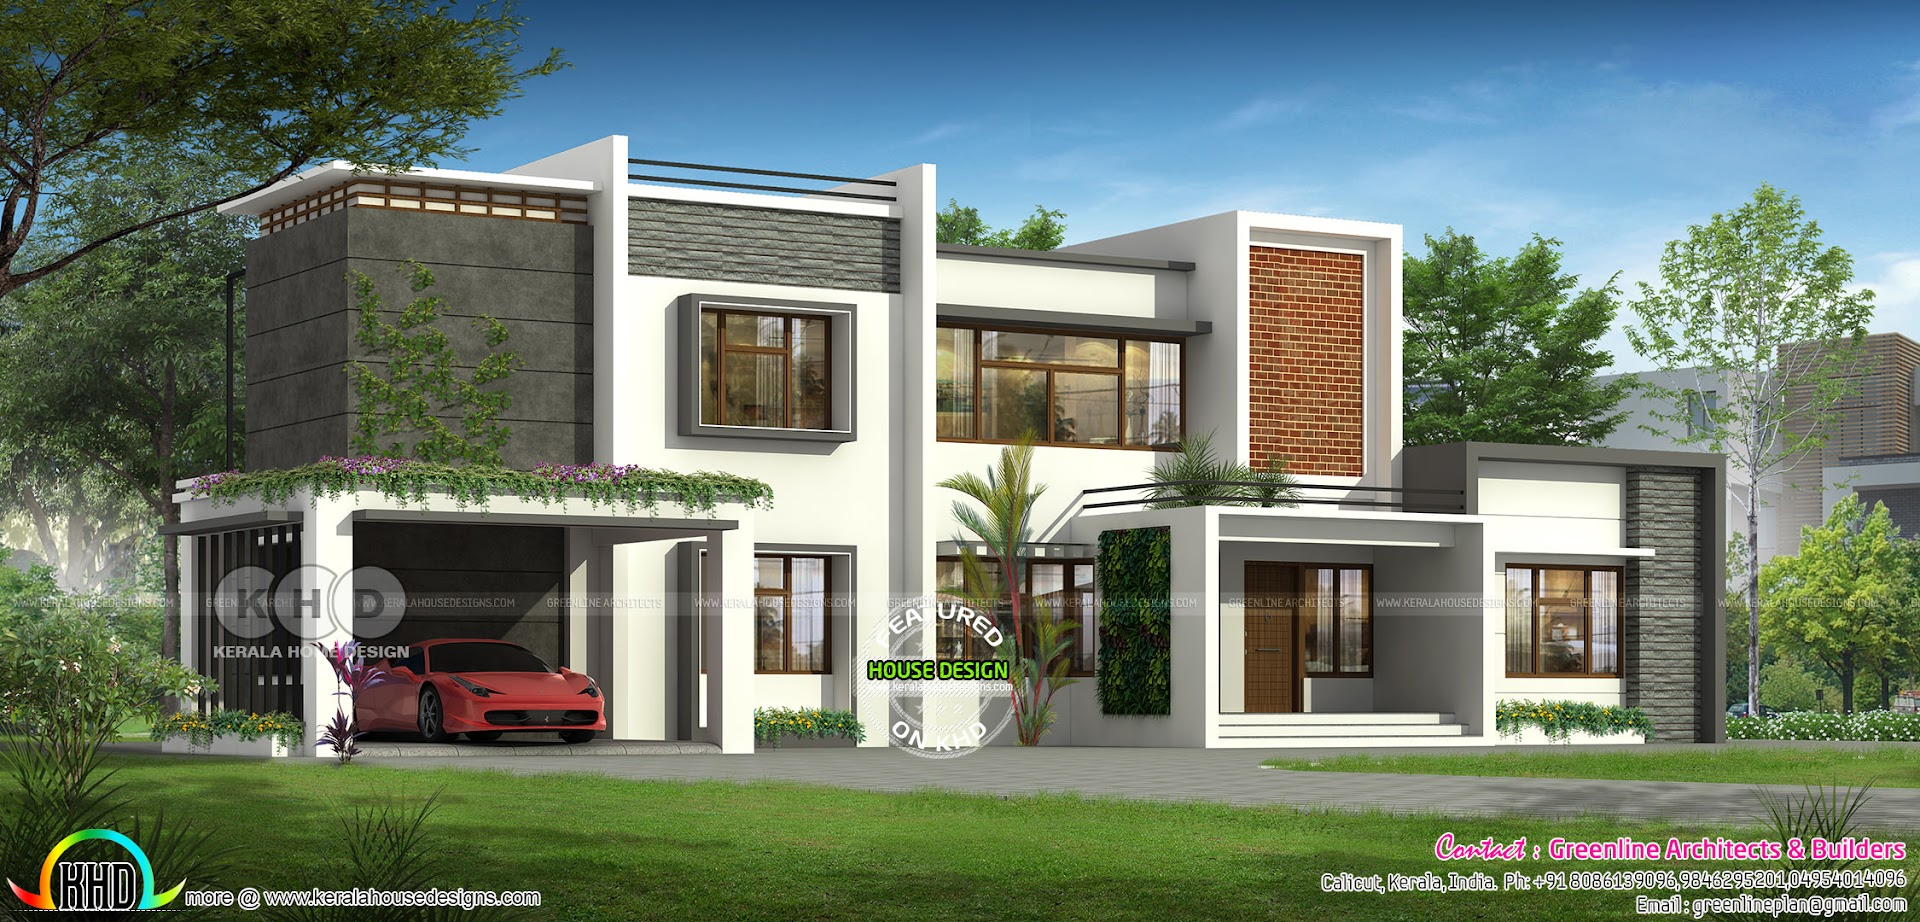 5 bedroom luxury modern house plan design